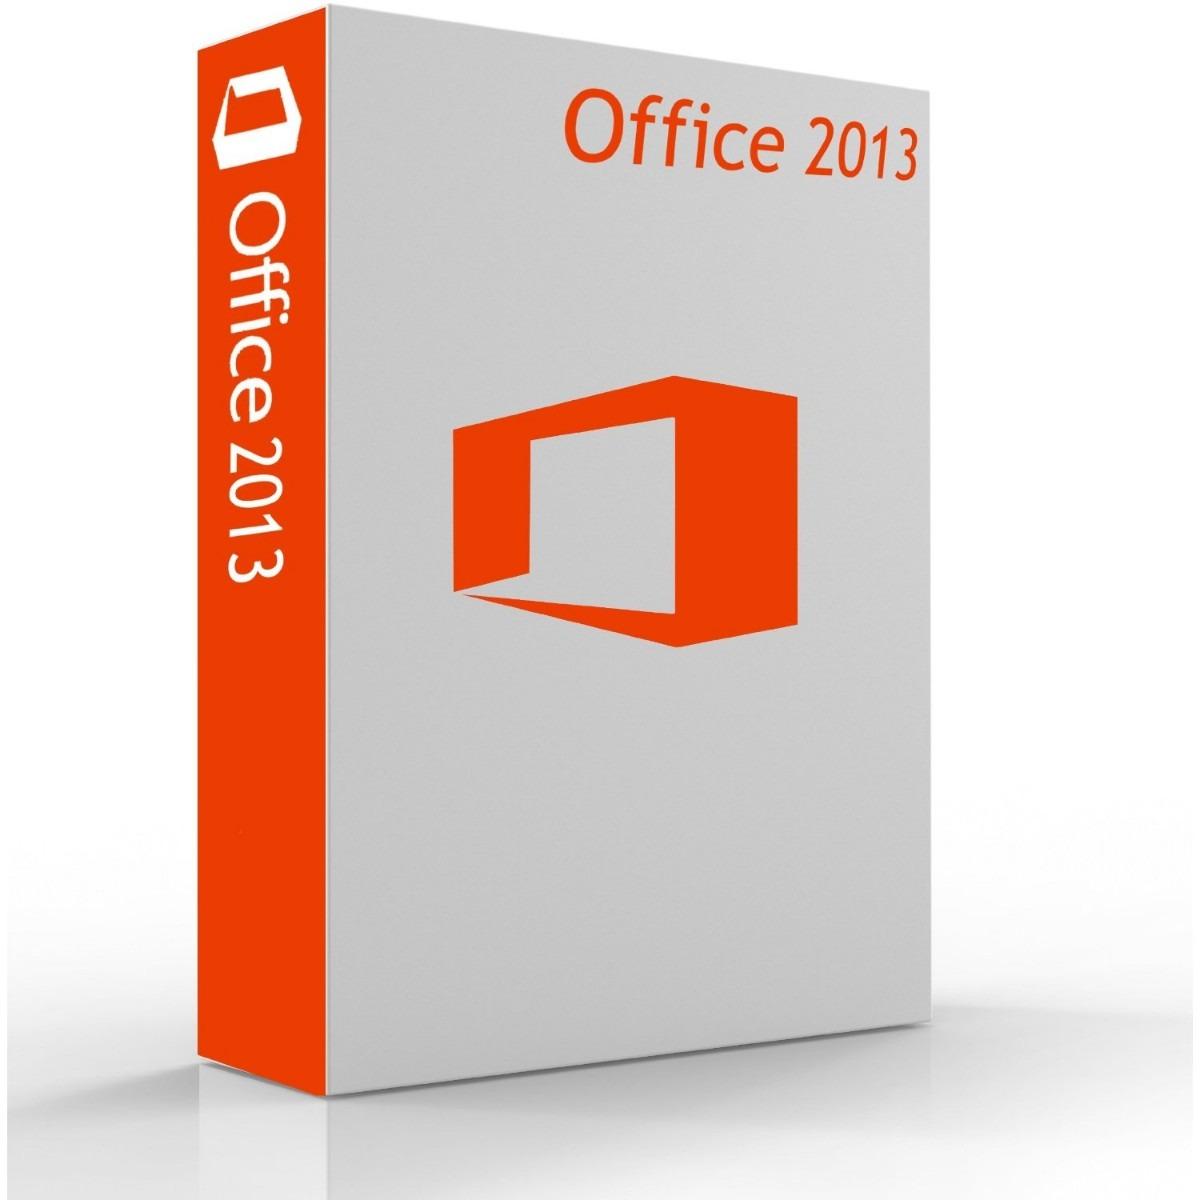 Microsoft Office 2013 (Subido a Mega)